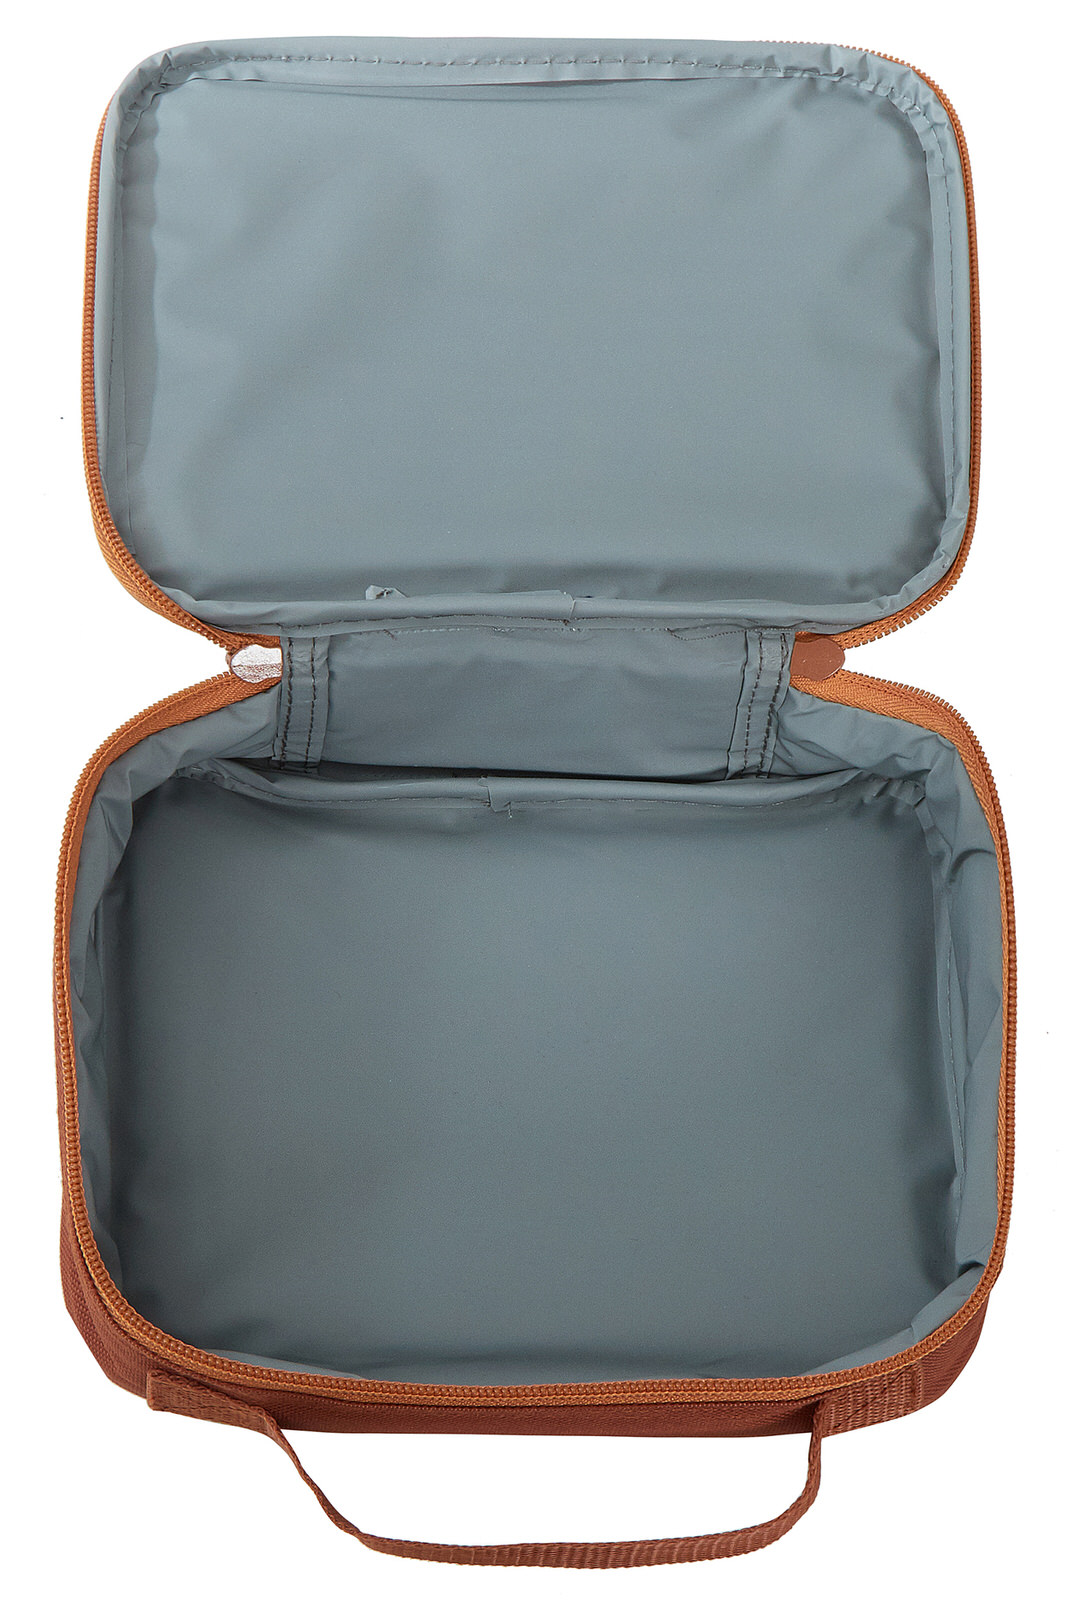 miniatuur 22 - Paddington Bear Kids Backpack + Detachable Lunch Bag/Pencil Case Nursery School